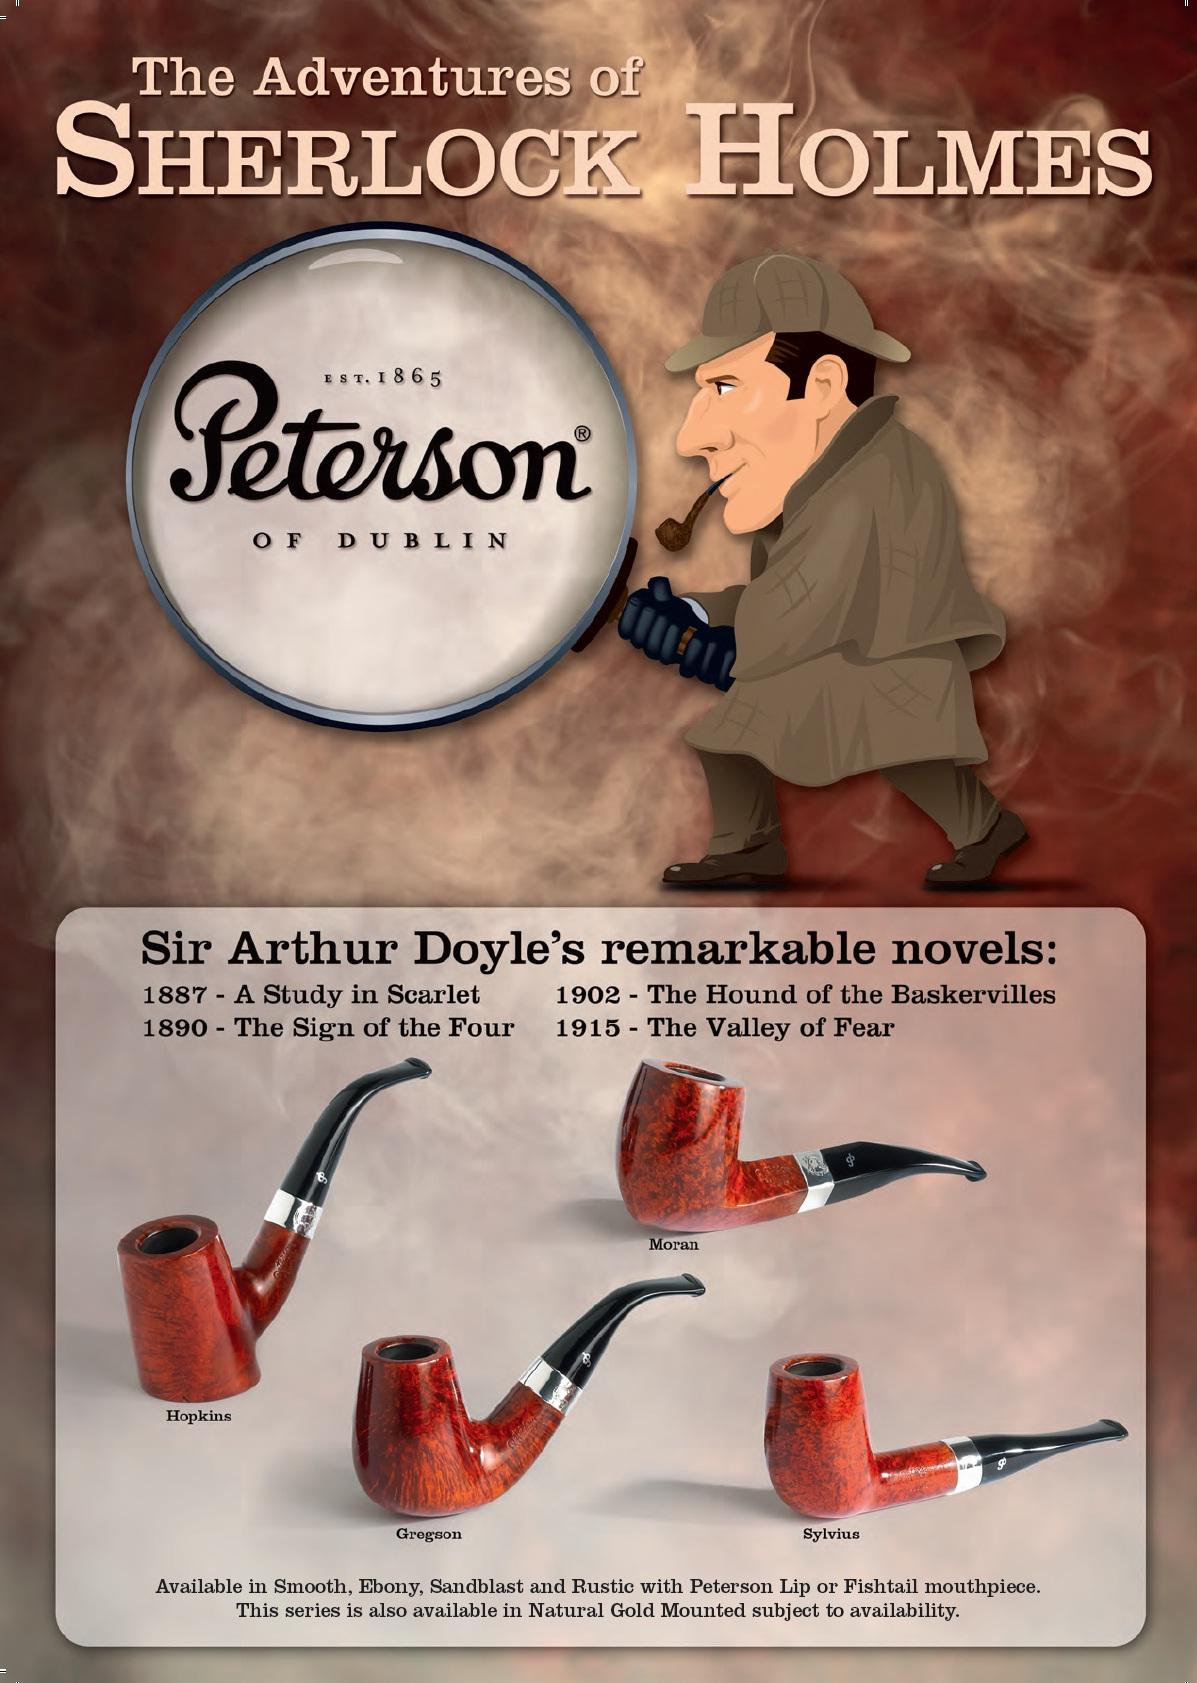 NEW Peterson Pipe Ebony 314 Smooth P Lip